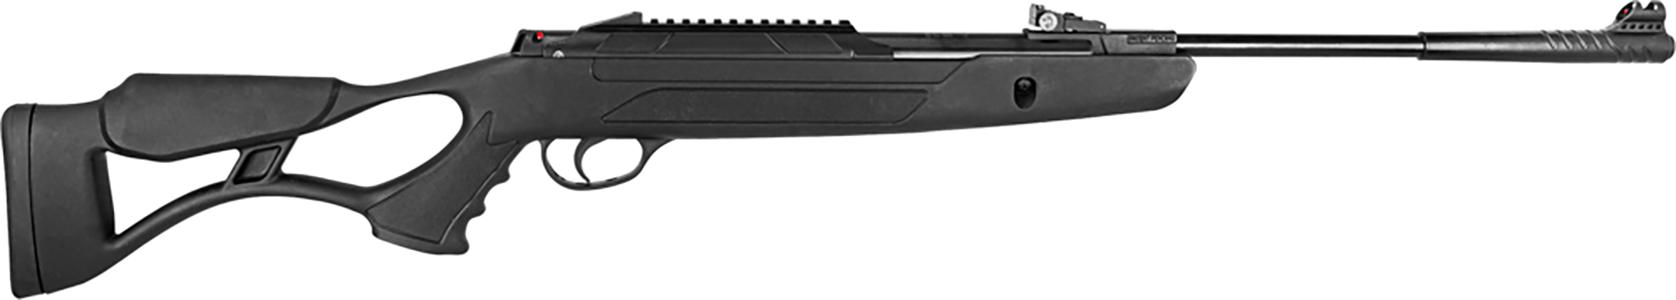 Carabina Pressão Rossi Hatsan Airtact PD 5,5mm